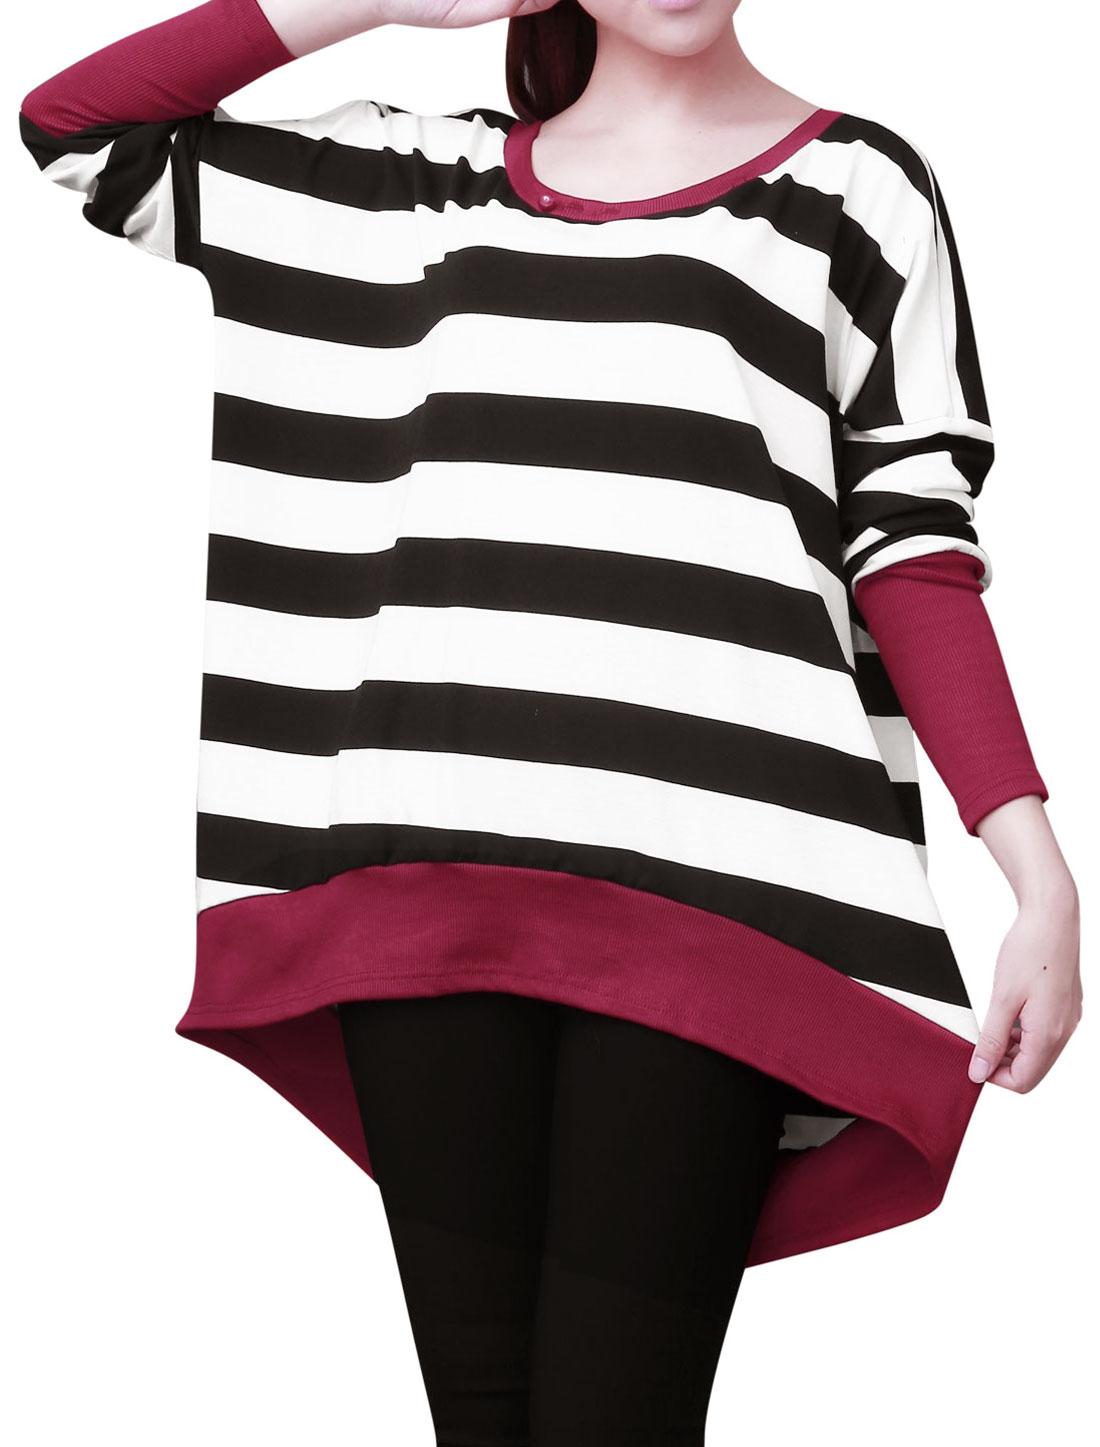 Lady Pullover Stripes Prints Cutout Sleeveless Black White Tops L